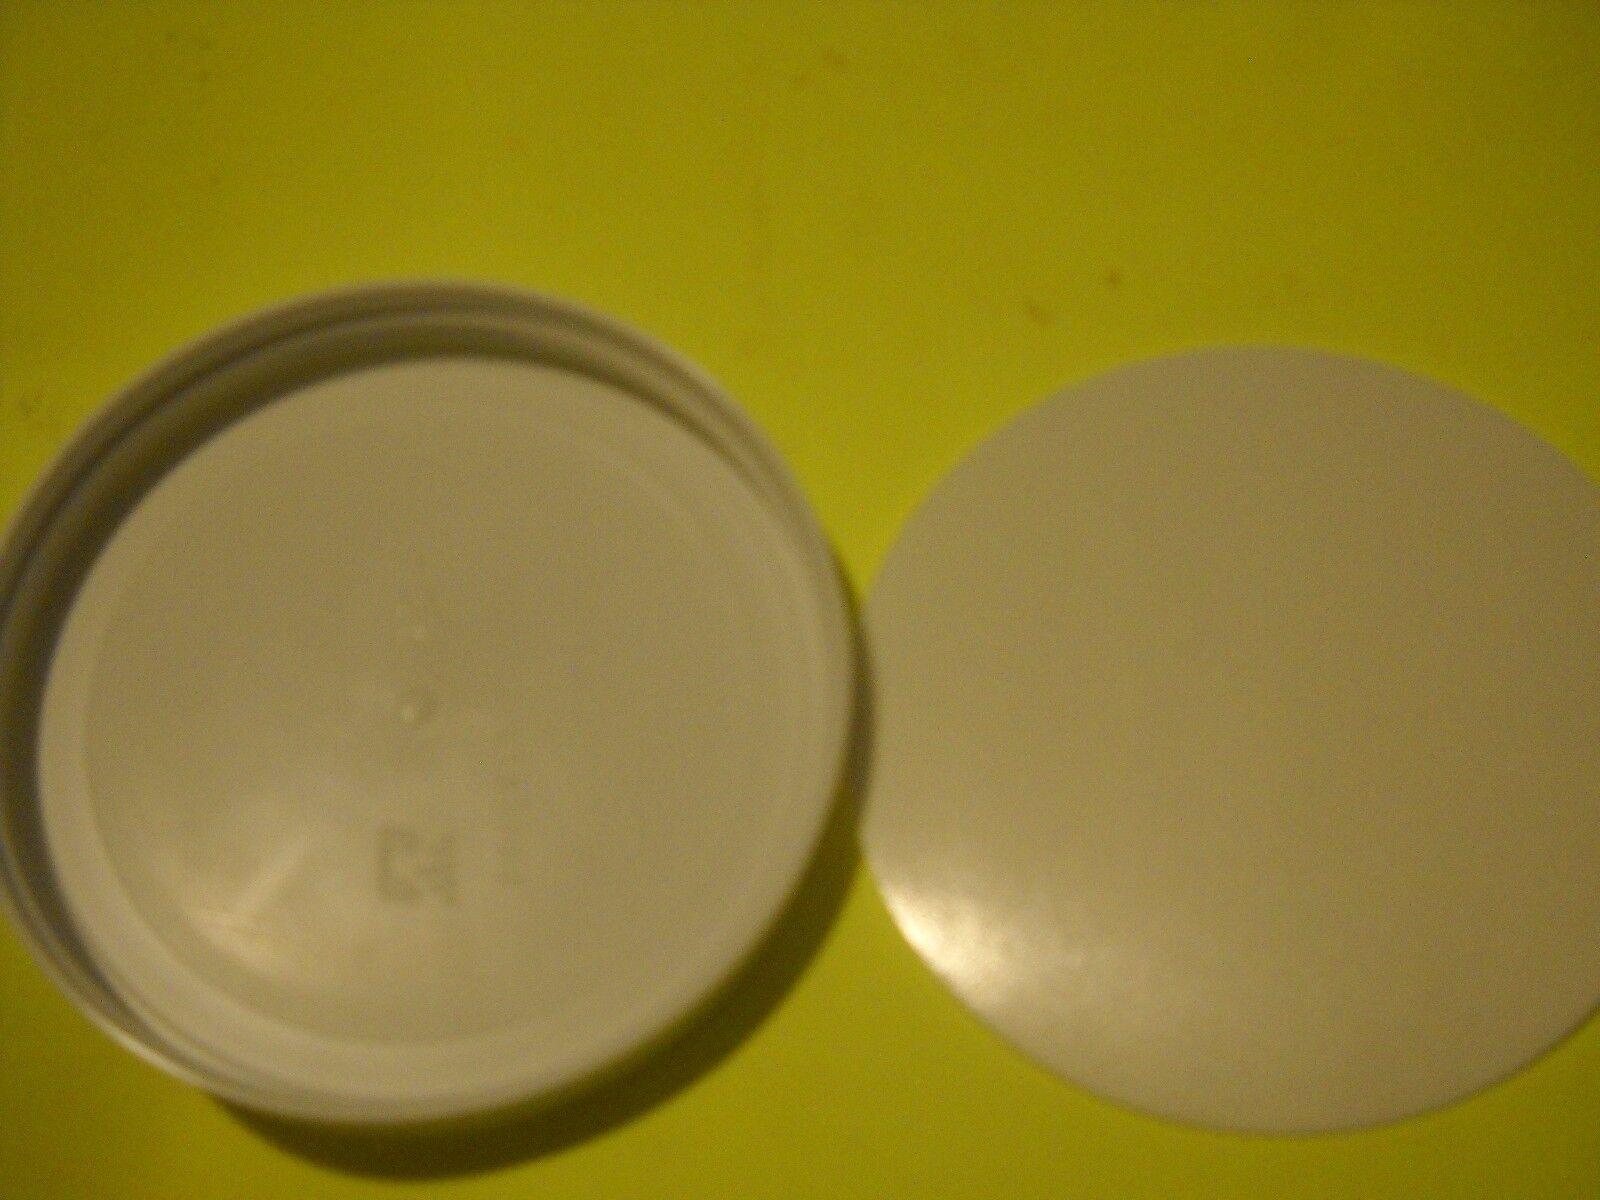 Pakkon 1 Gallon Wide Mouth Glass Jar REPLACEMENT PLASTIC LID